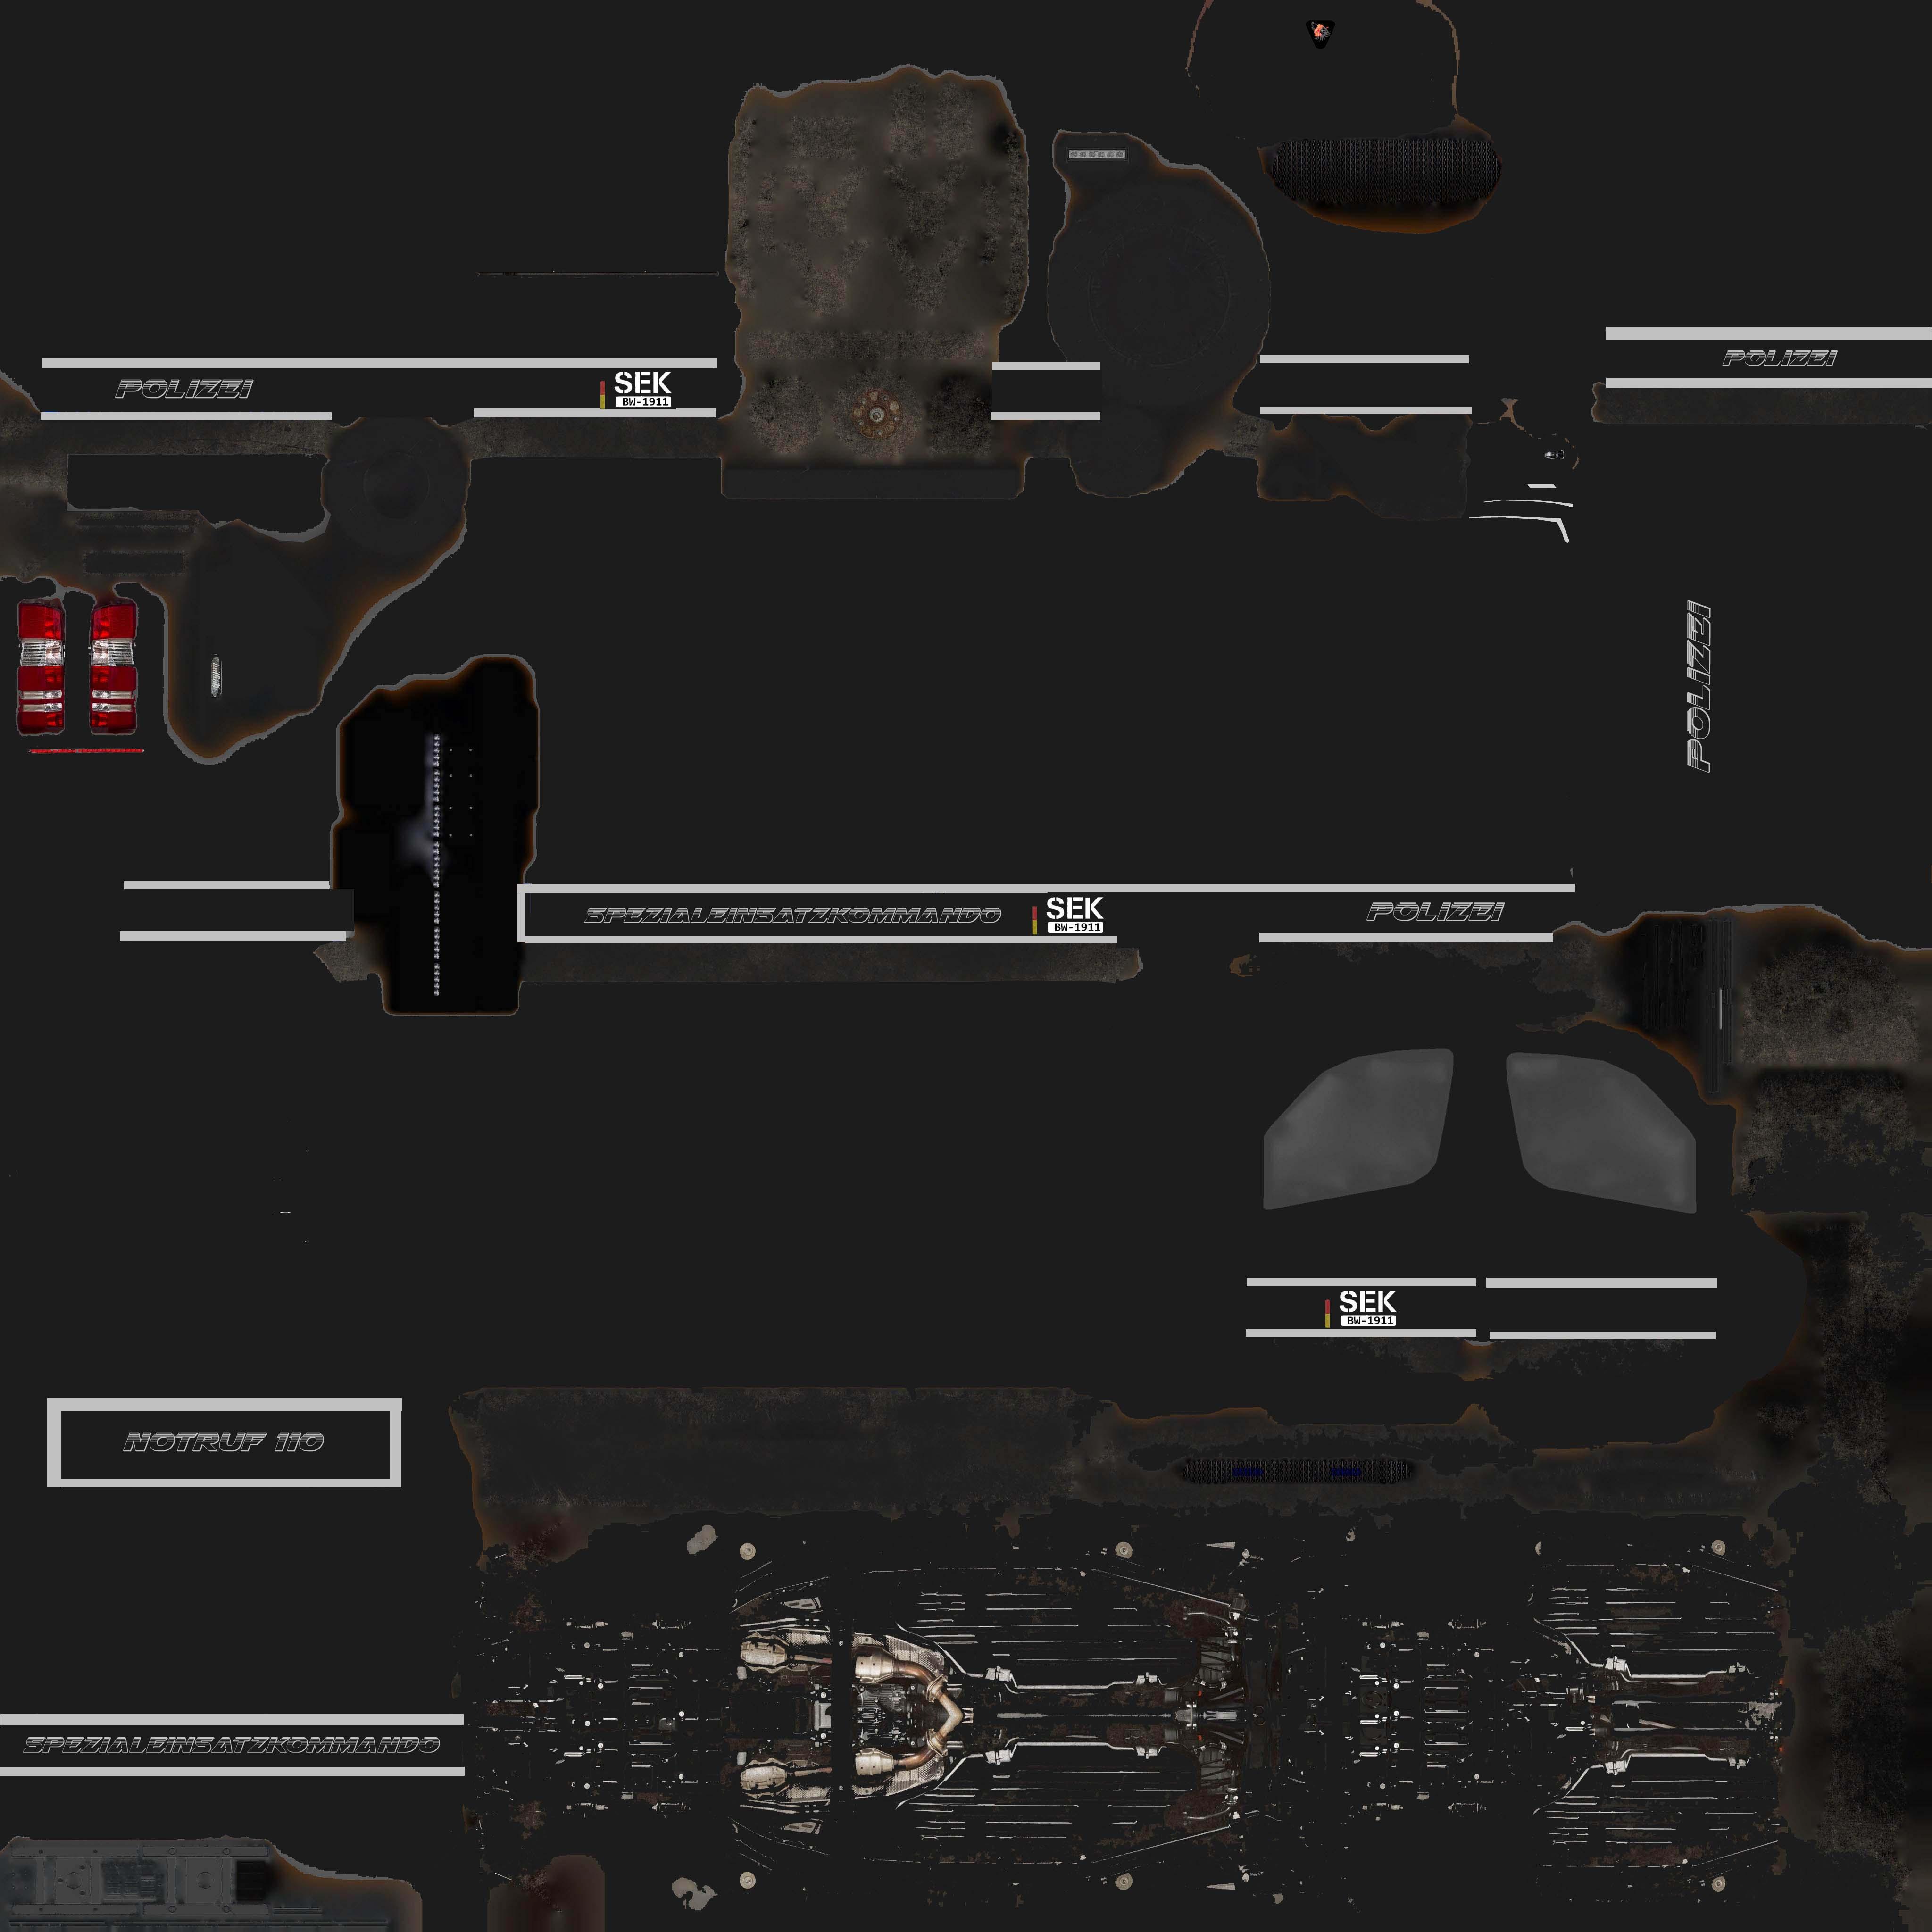 Free Skin] Police Transporter - Graphics - Altis Life RPG